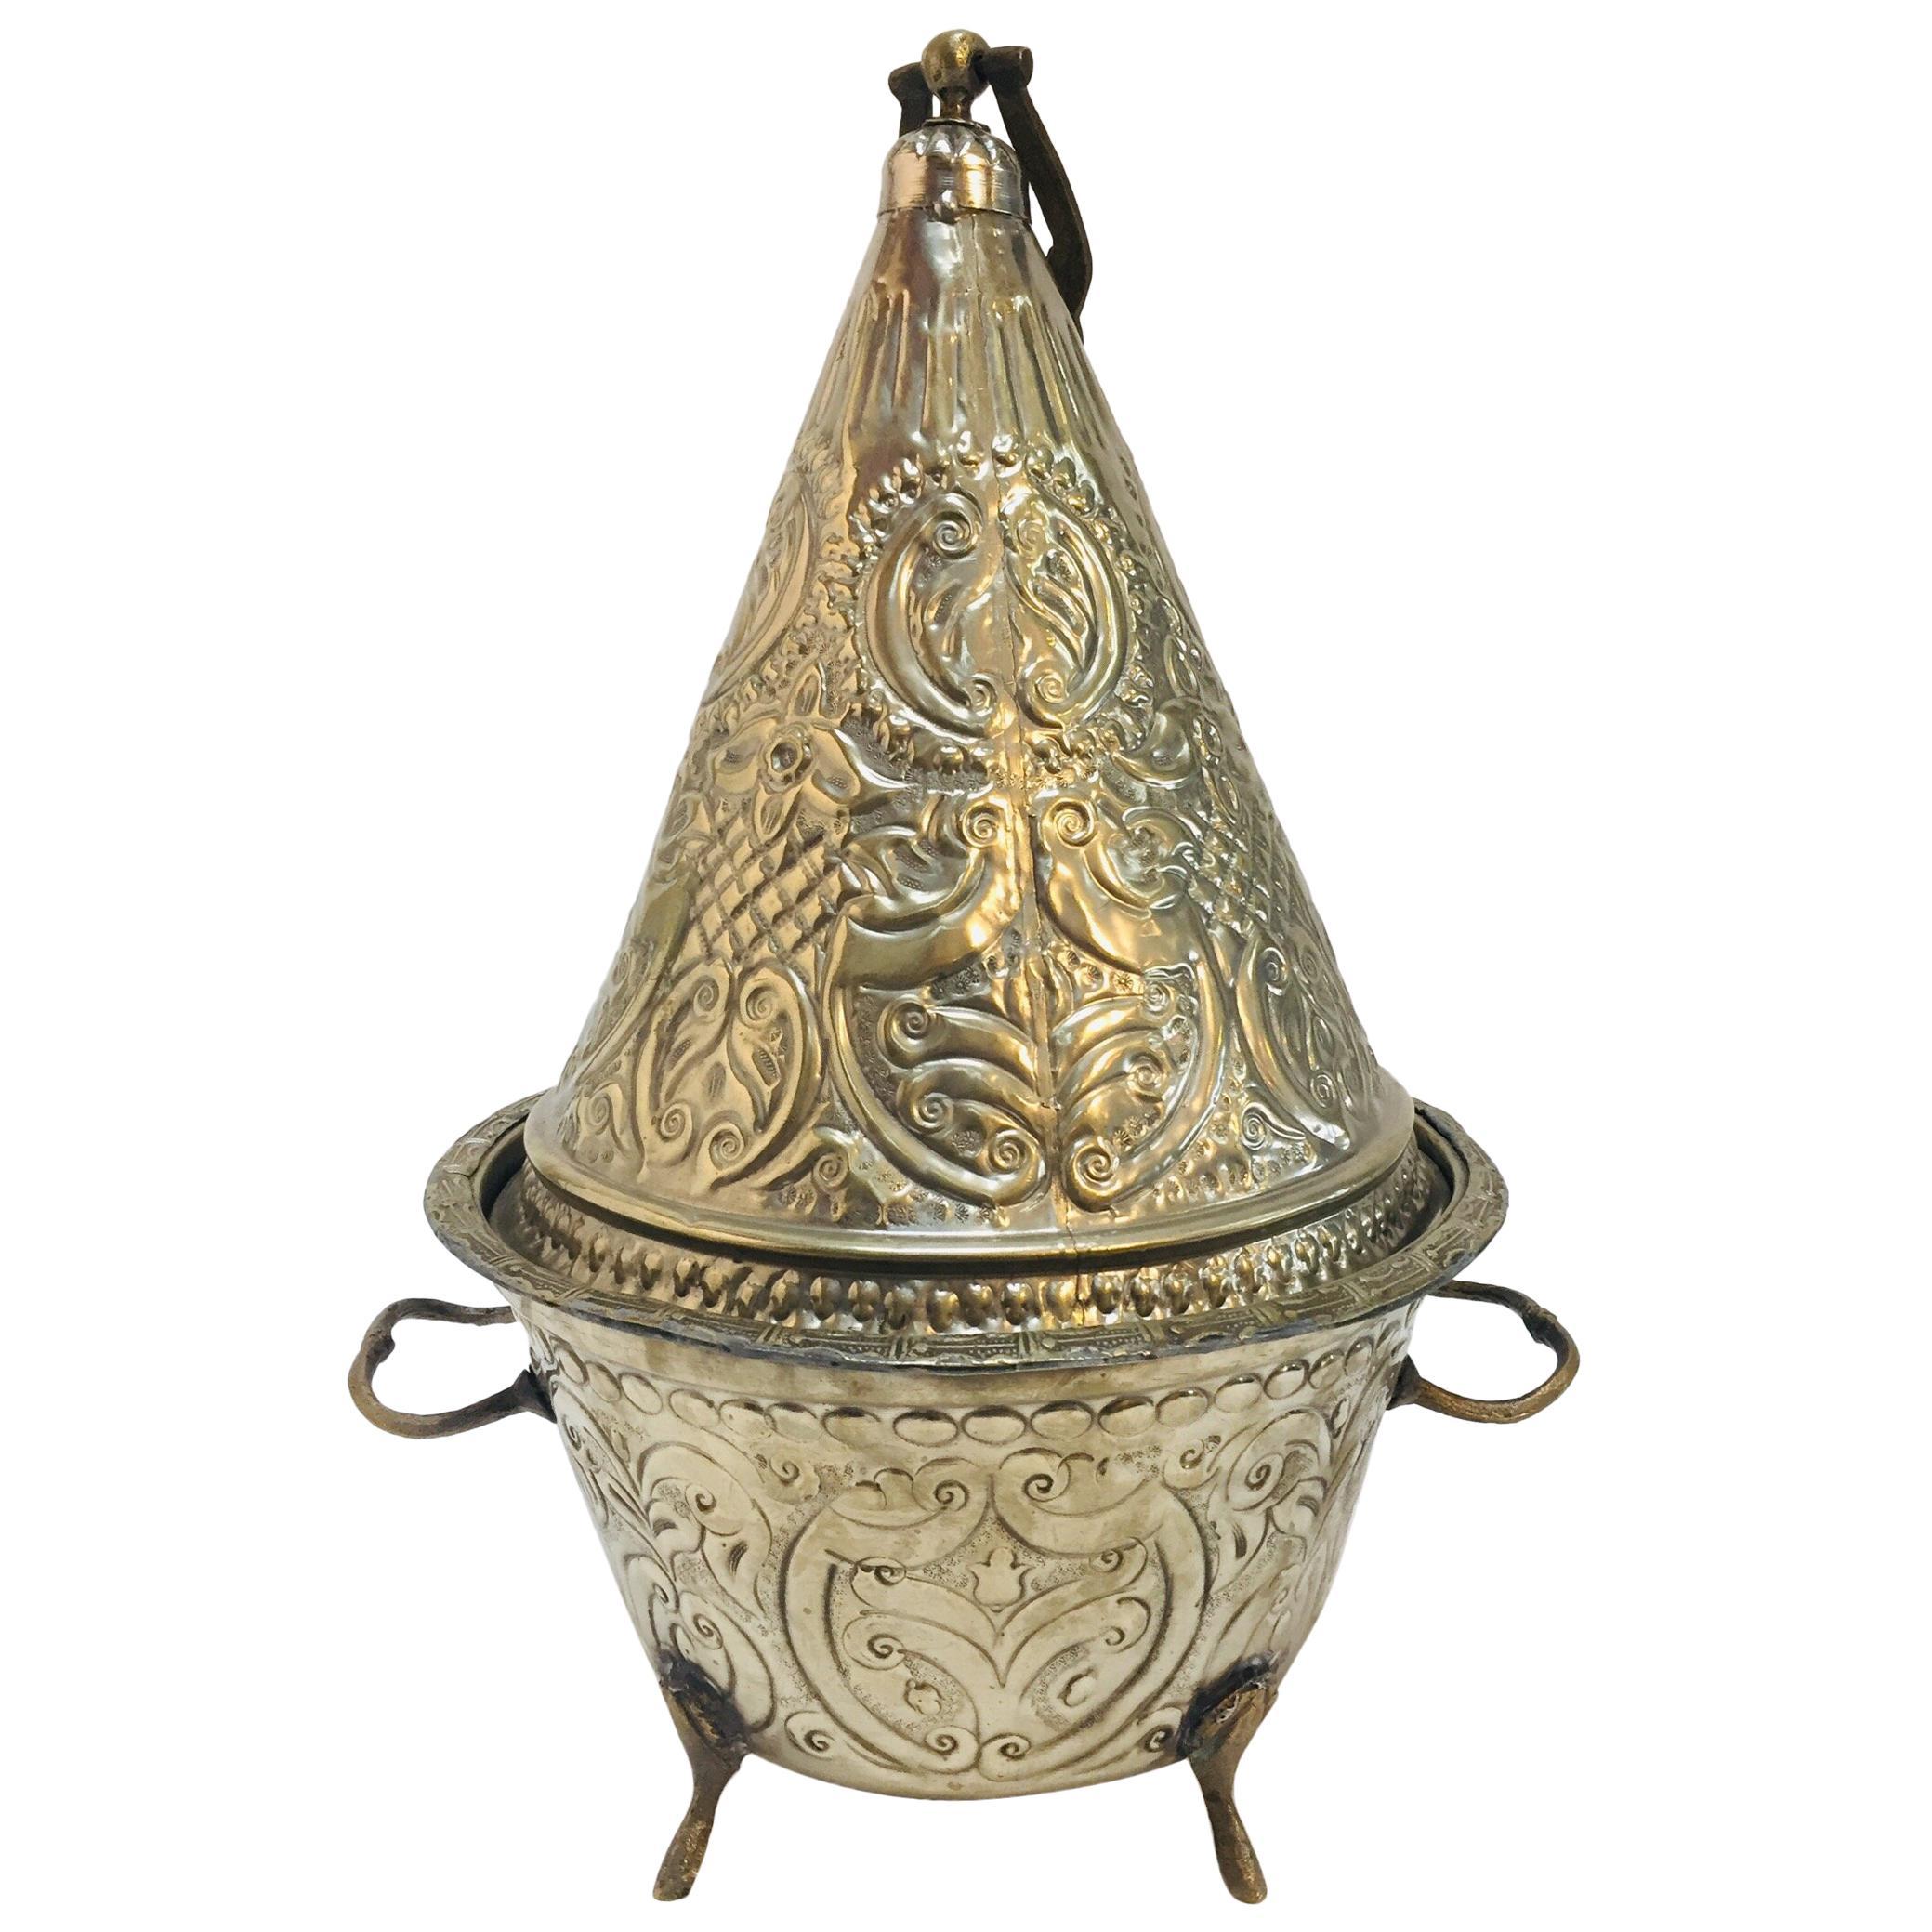 Moroccan Silver Repousse Decorative Dish Tajine with Cover